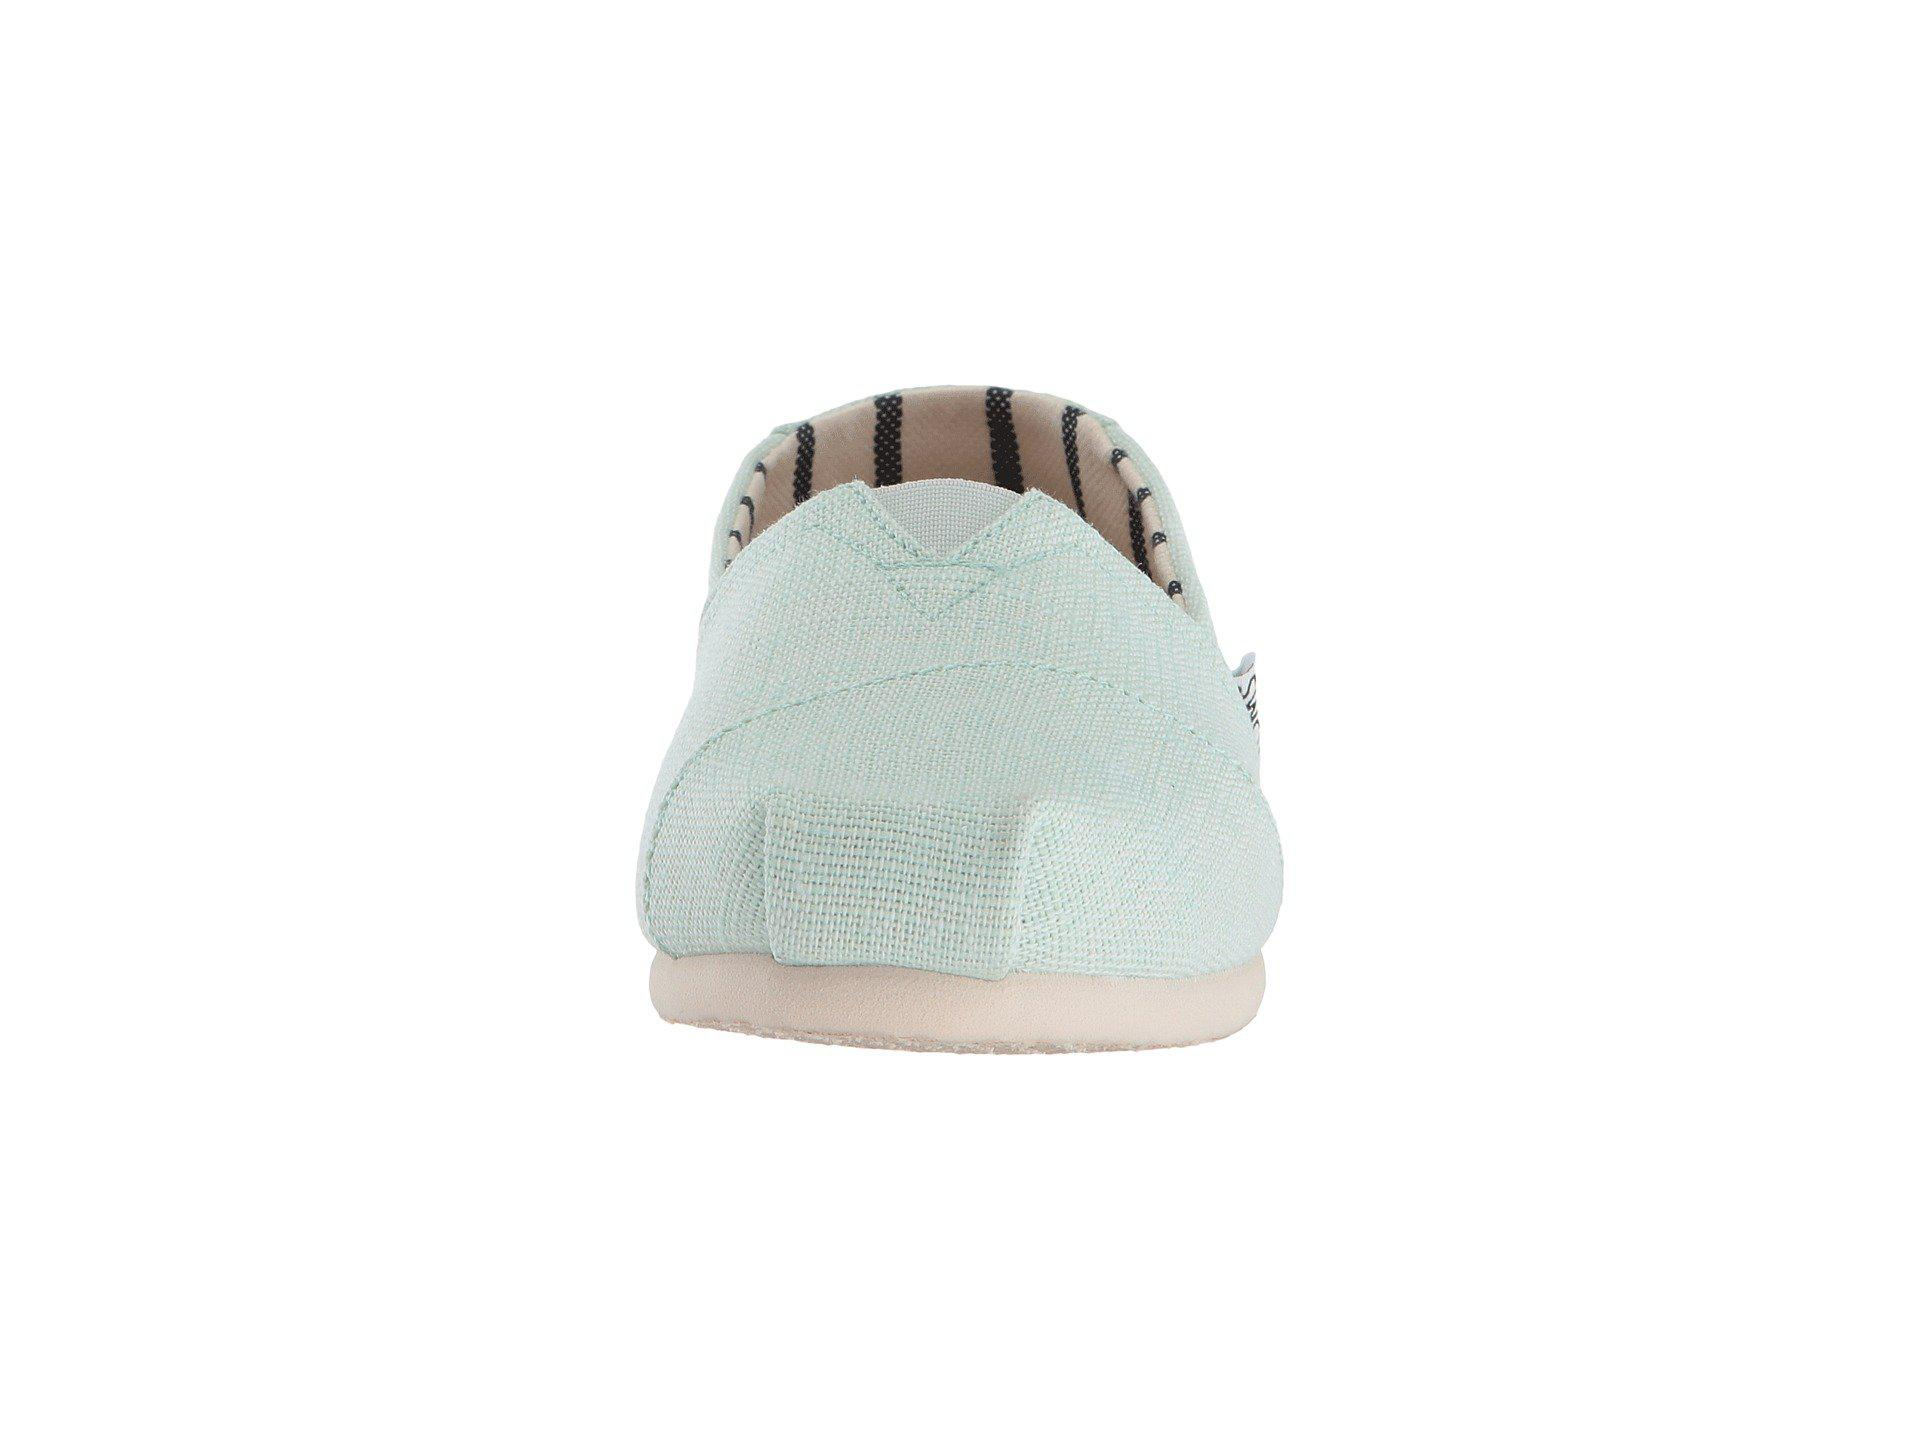 c0a6fe2c53c ... Venice Collection Alpargata (aqua Glass Heritage Canvas) Women s Slip  On Shoes. View fullscreen